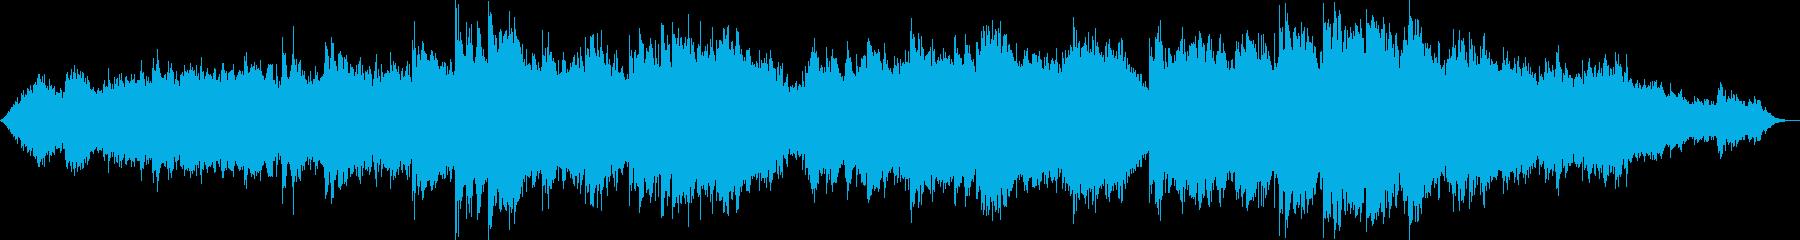 Ambientの再生済みの波形